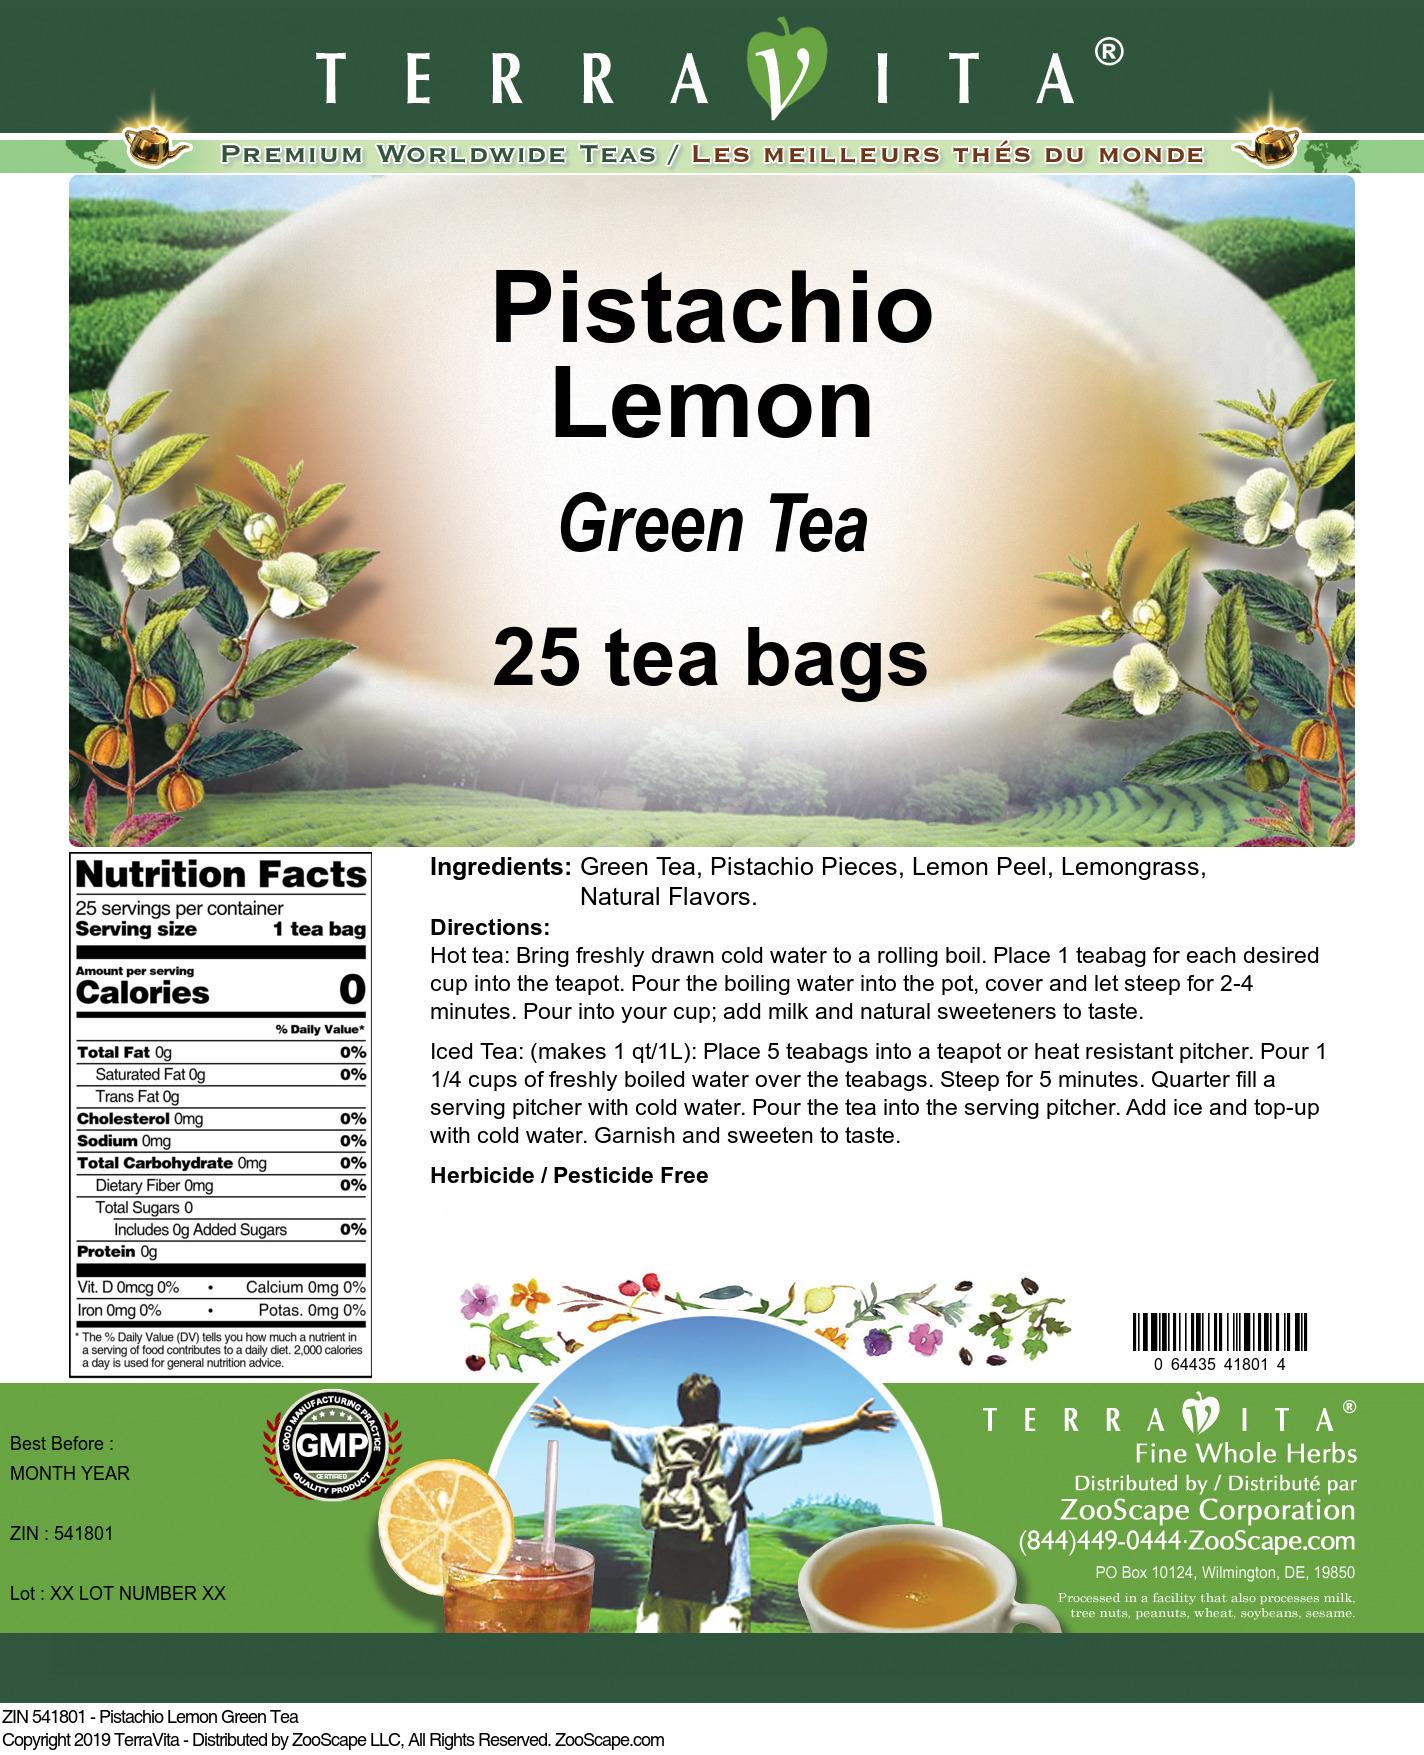 Pistachio Lemon Green Tea